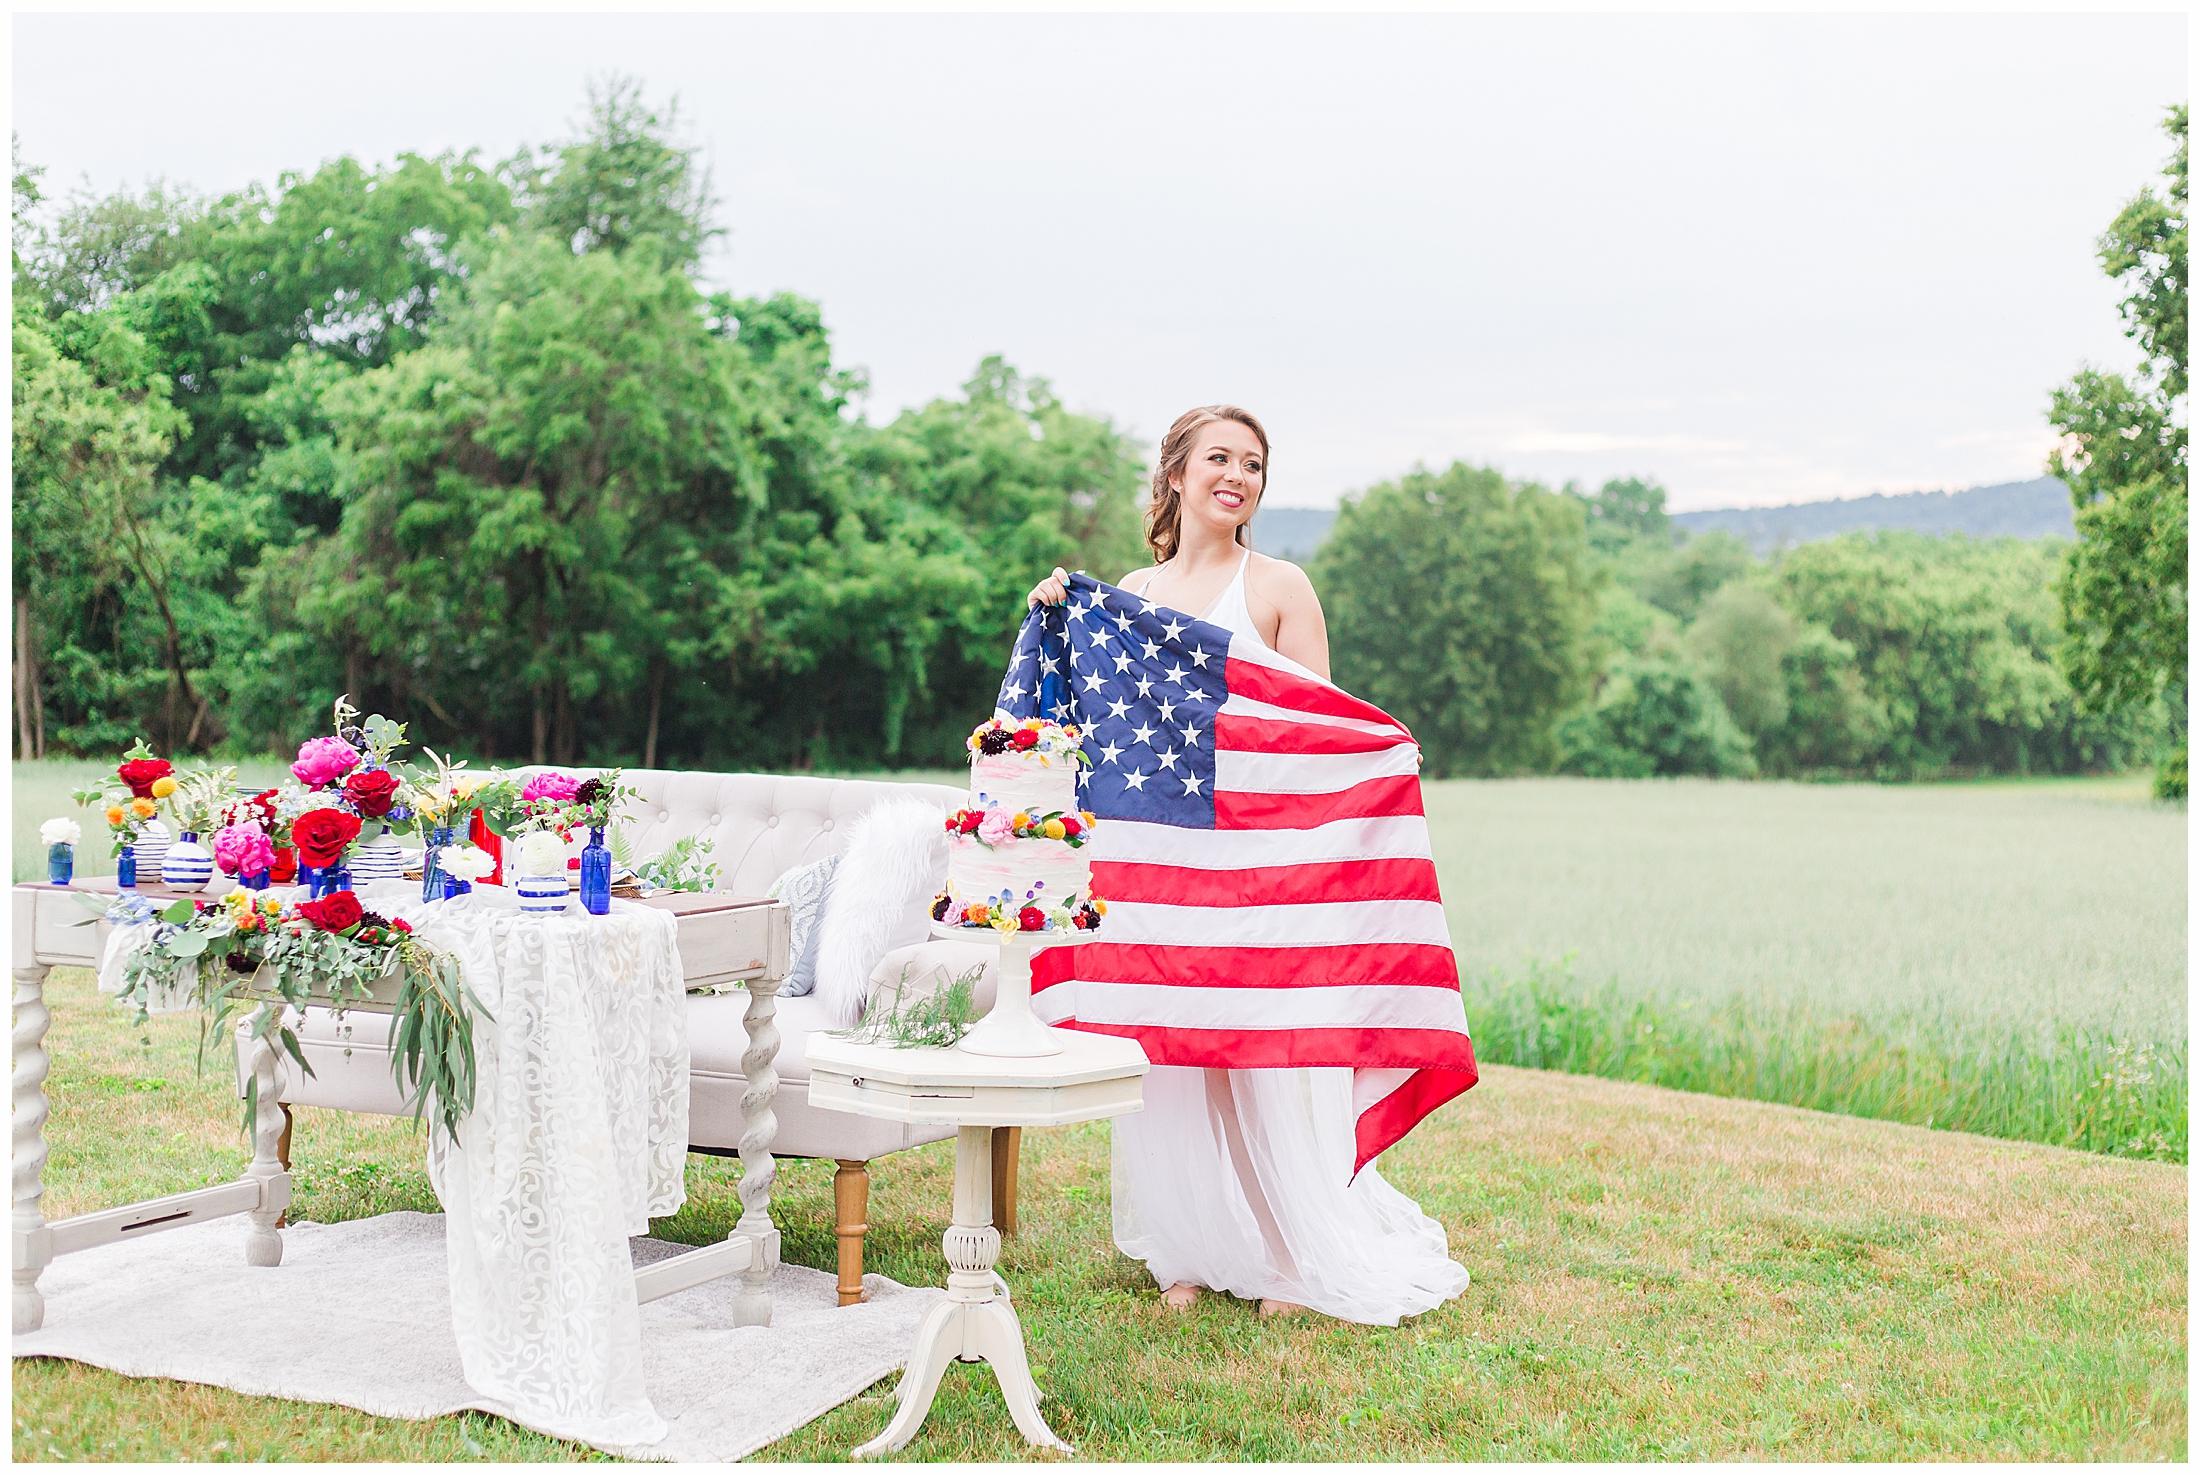 colorful-americana-wedding-shoot_0006.jpg